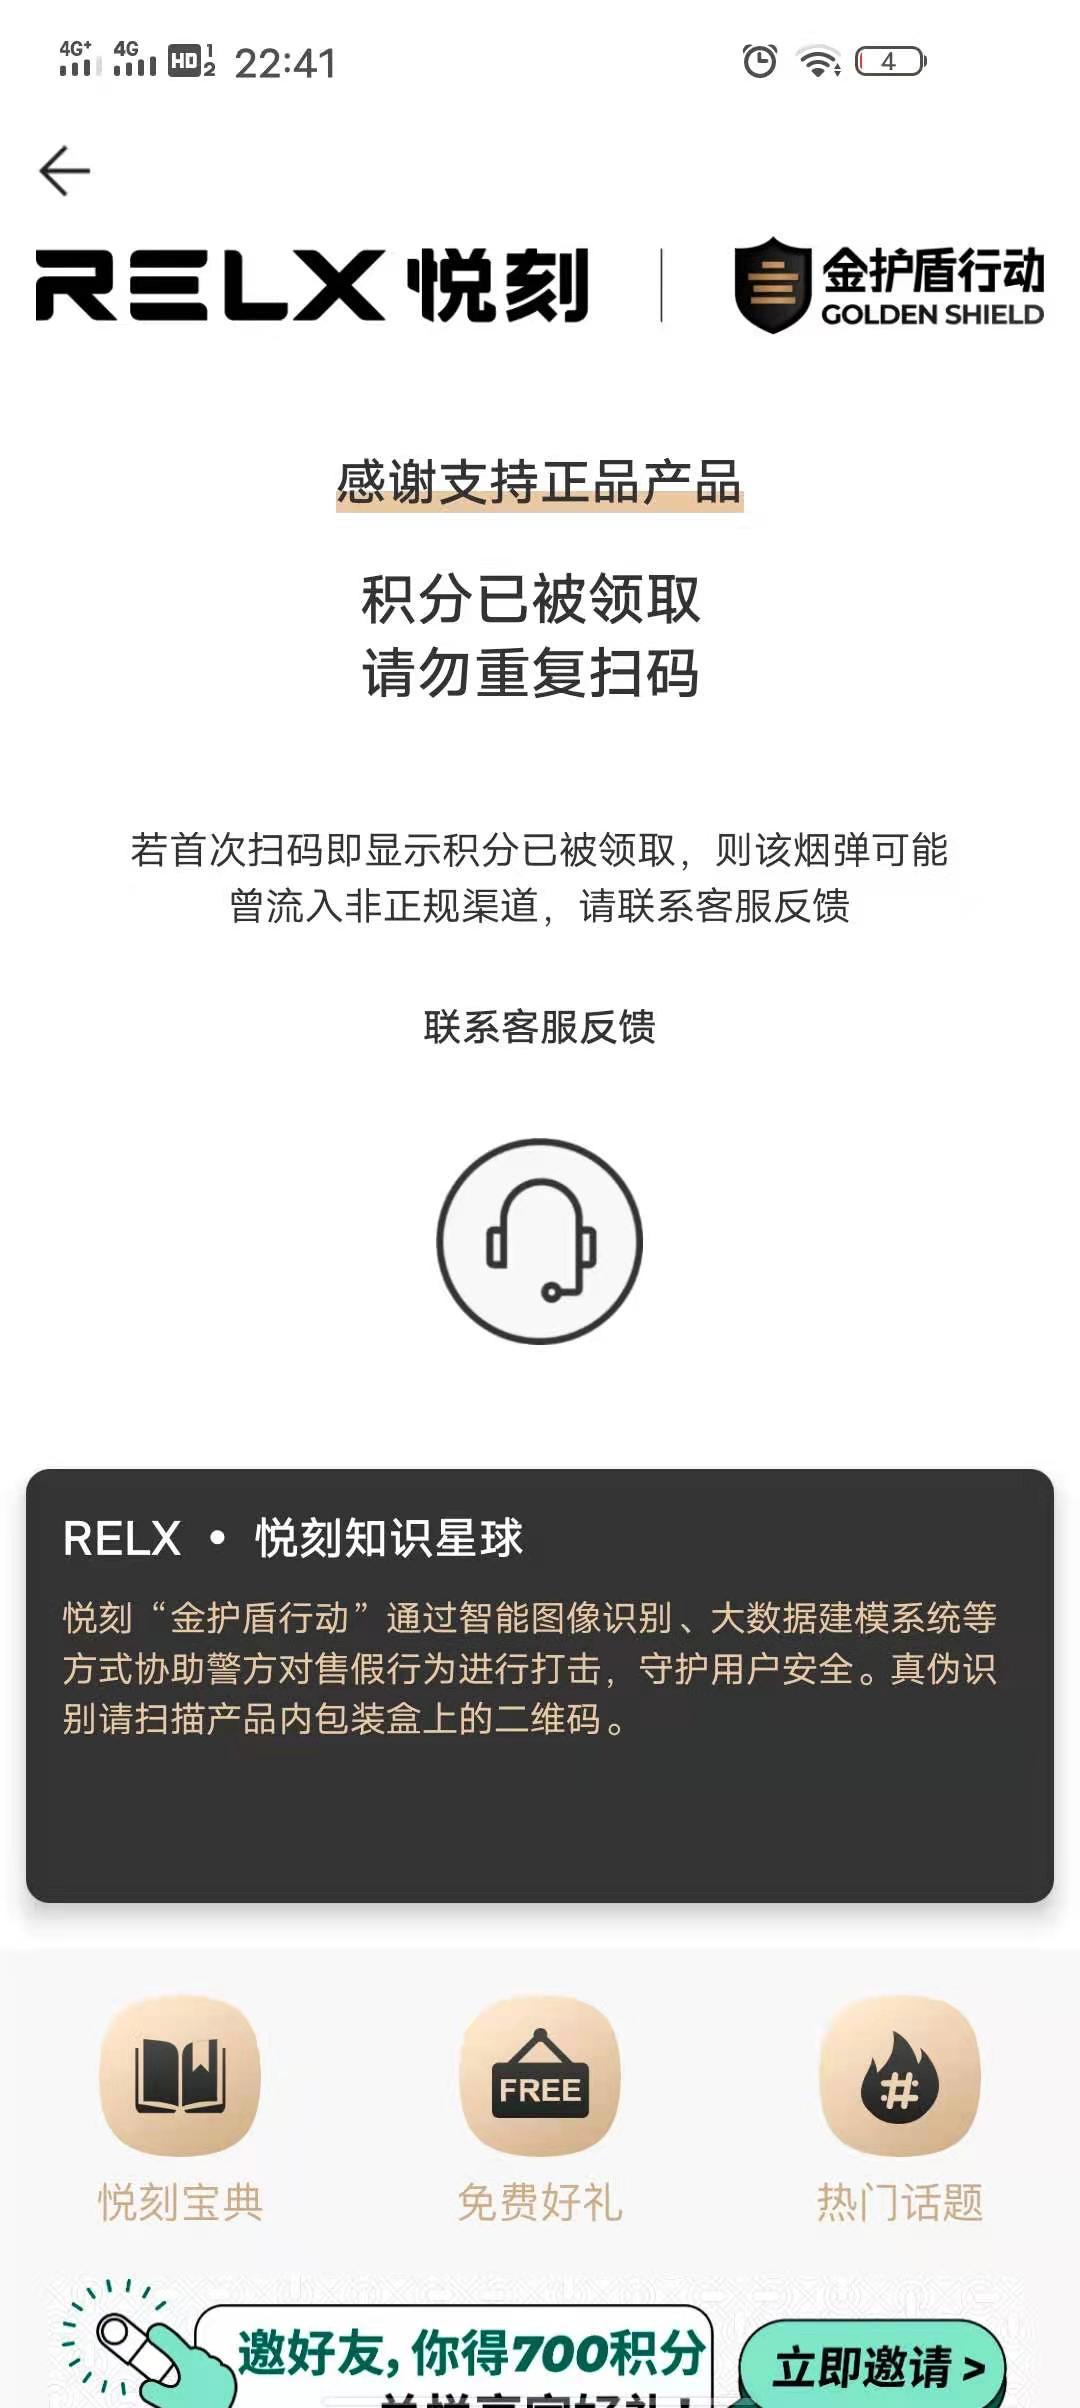 relx悦刻电子烟真假鉴别